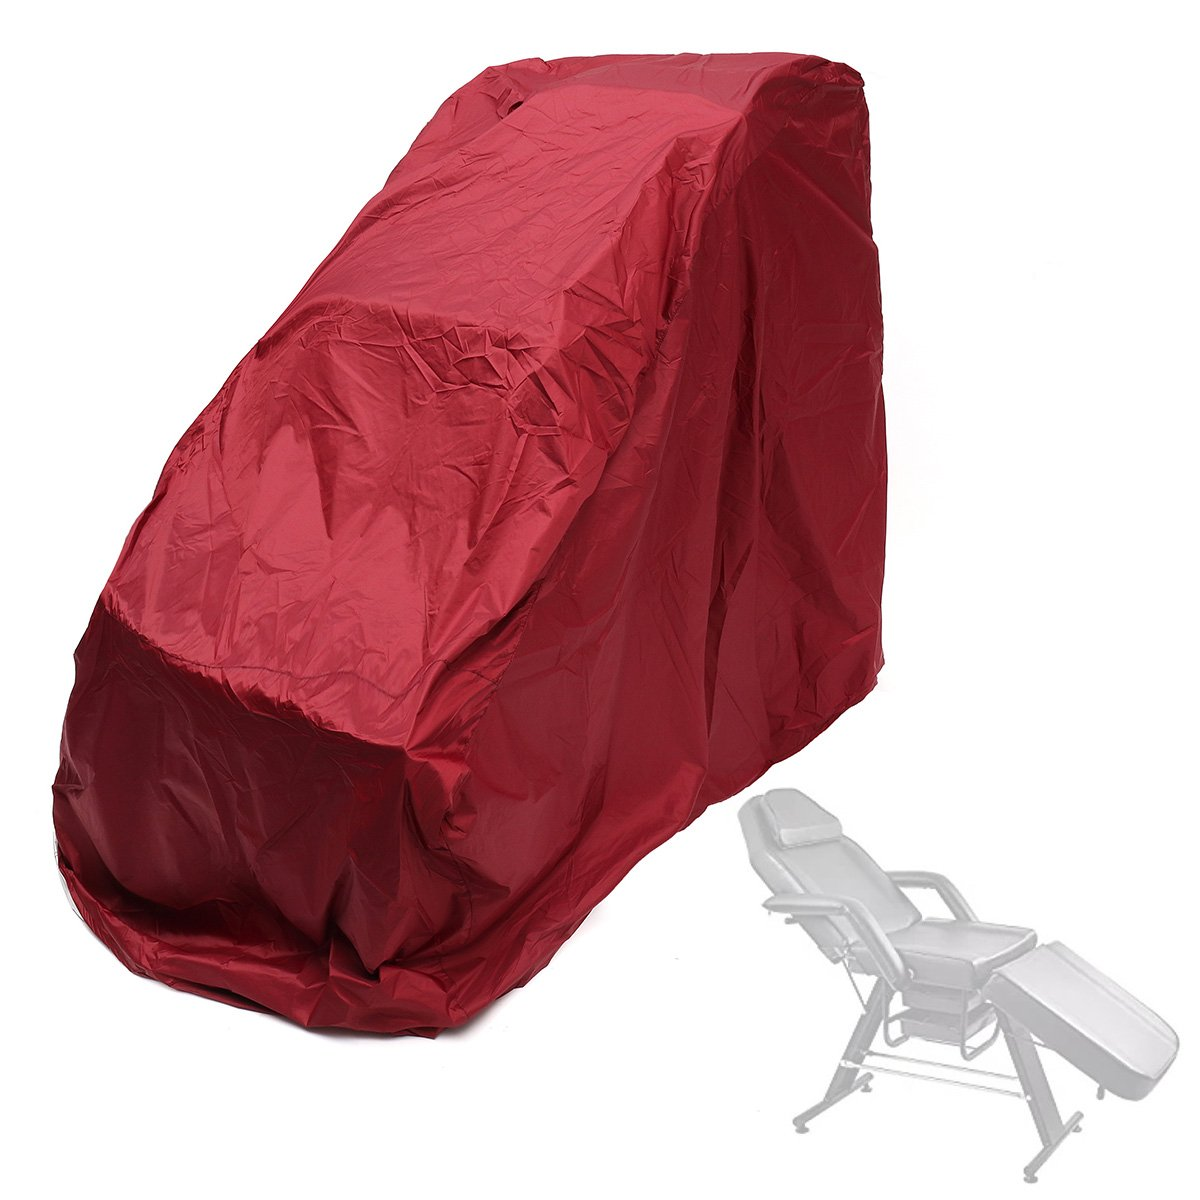 GUQQRZCT マッサージチェア保護カバーユニバーサルジッパーケースフルボディスタイルカバー (Color : ColorWine red) B07RY4XVTQ ColorWine red